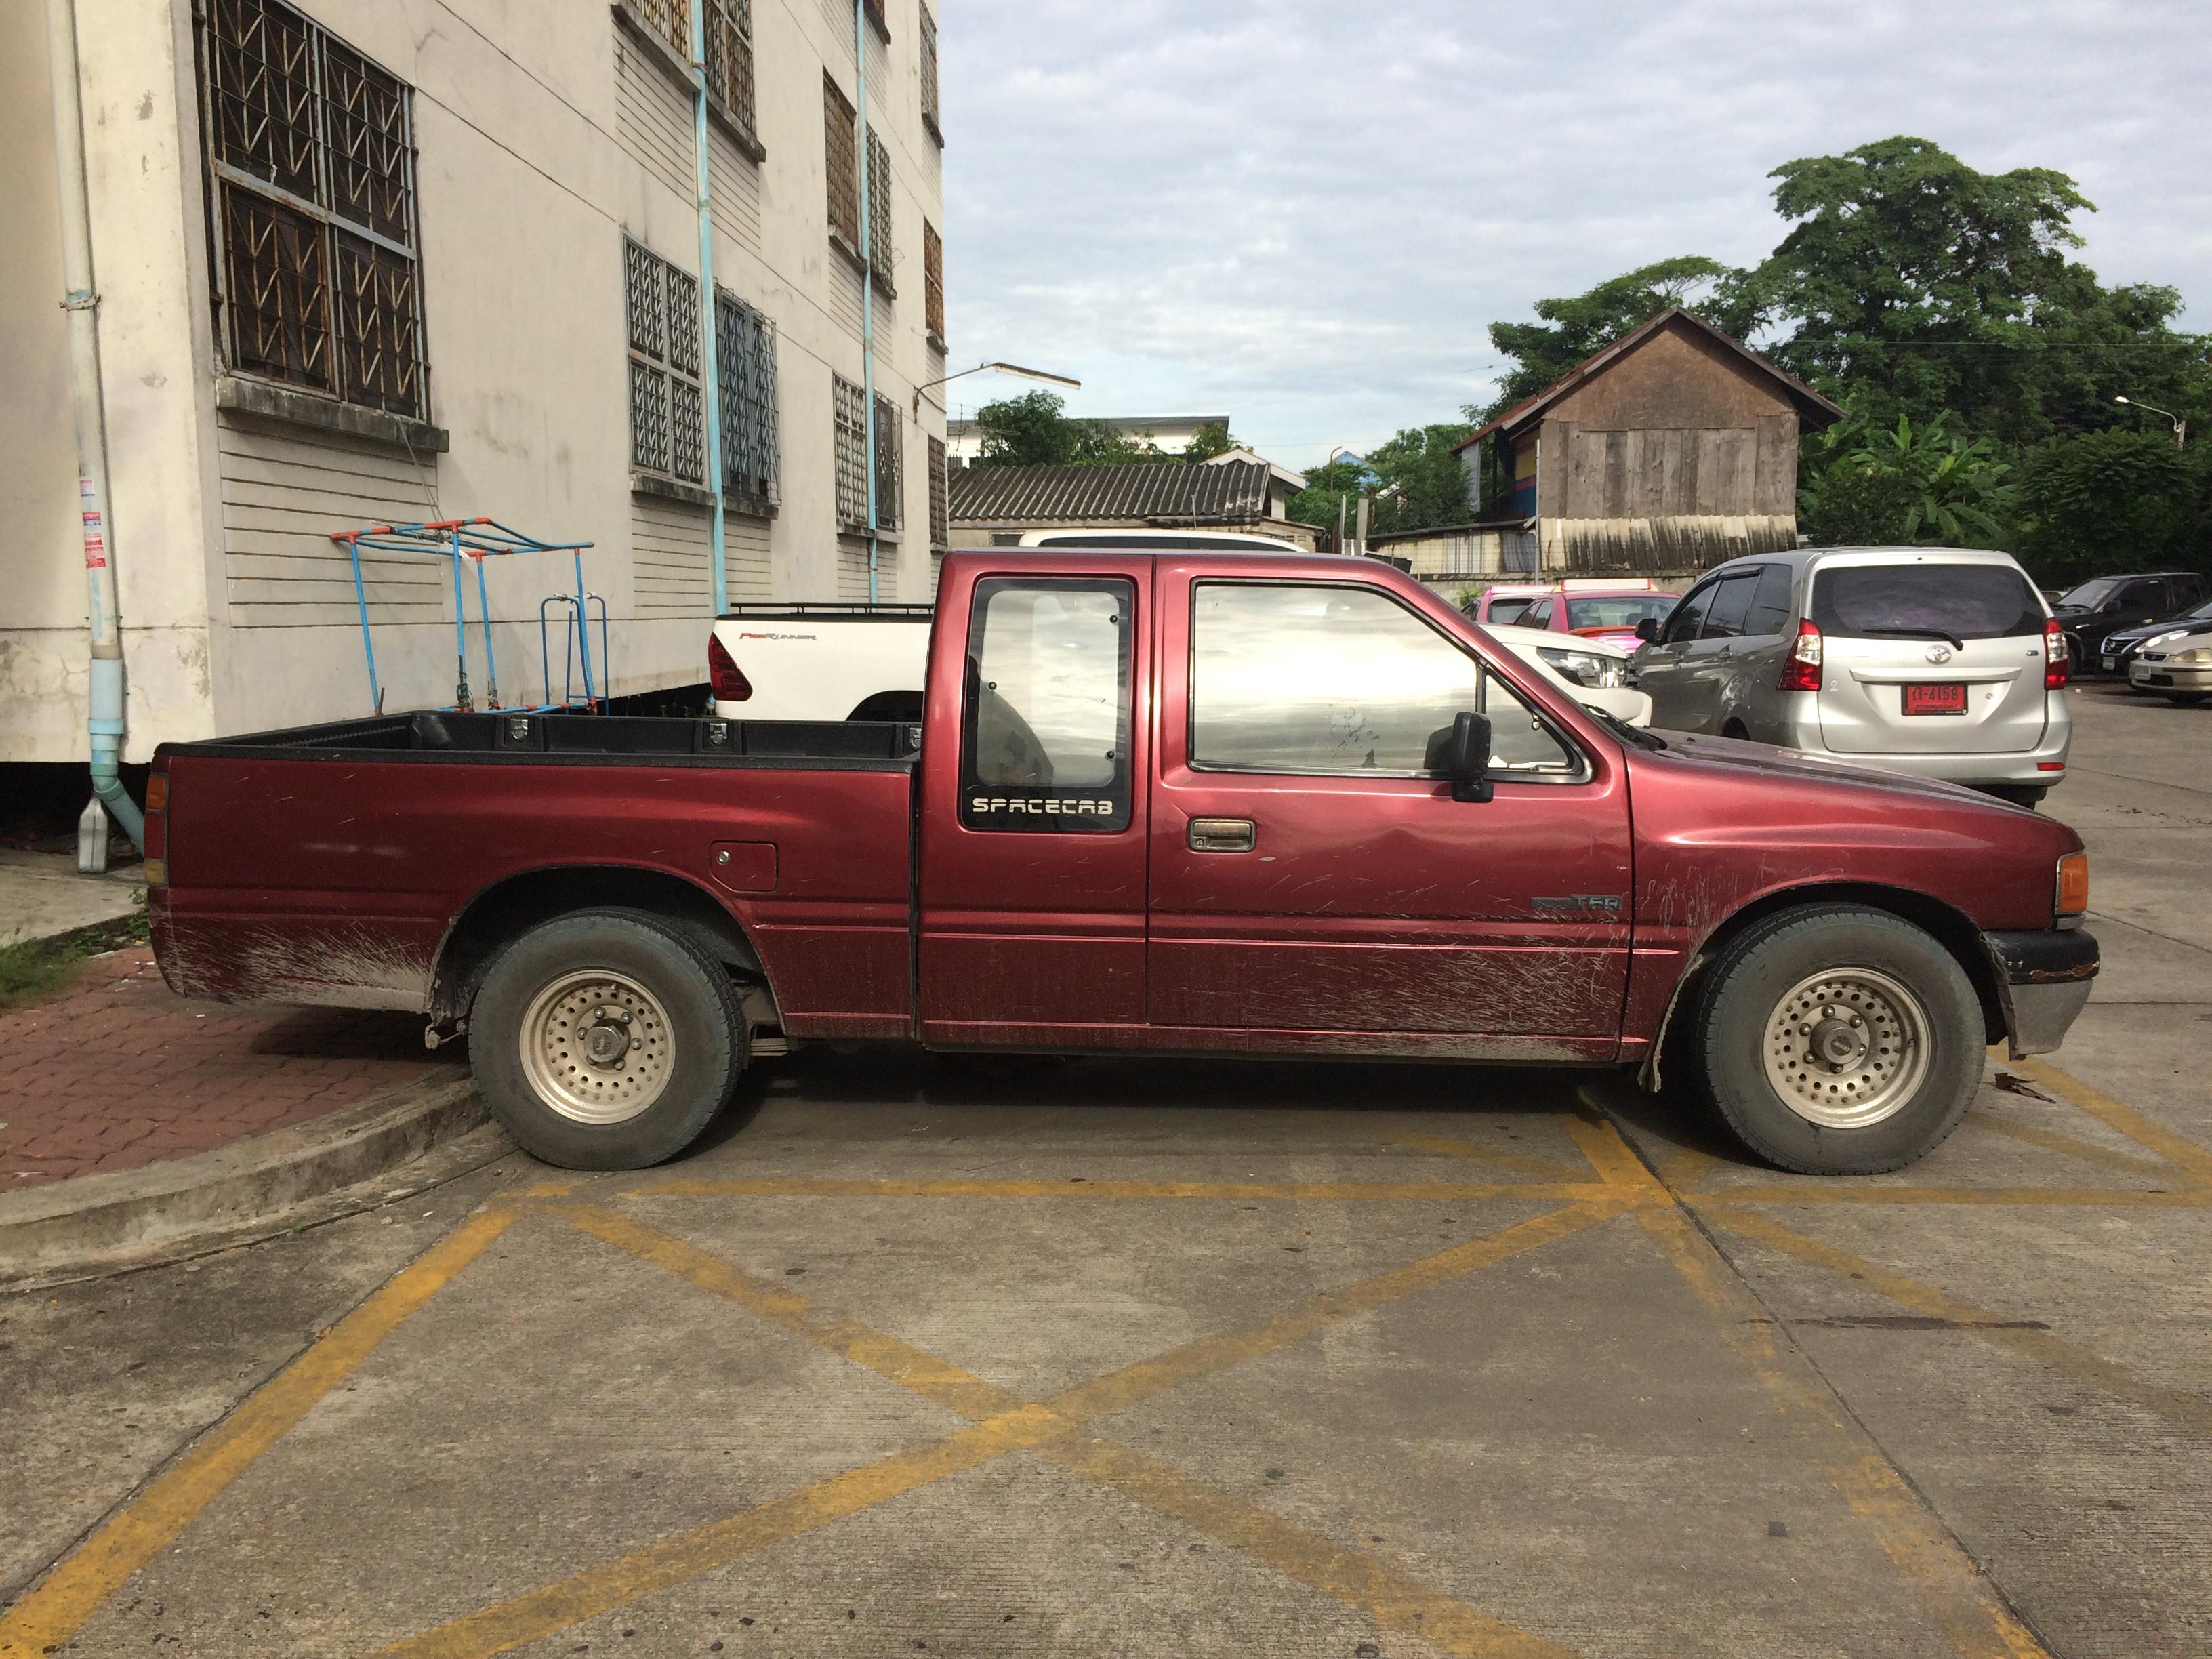 File:1988-1989 Isuzu Faster-Z (TF) Spacecab pickups trucks (19-08